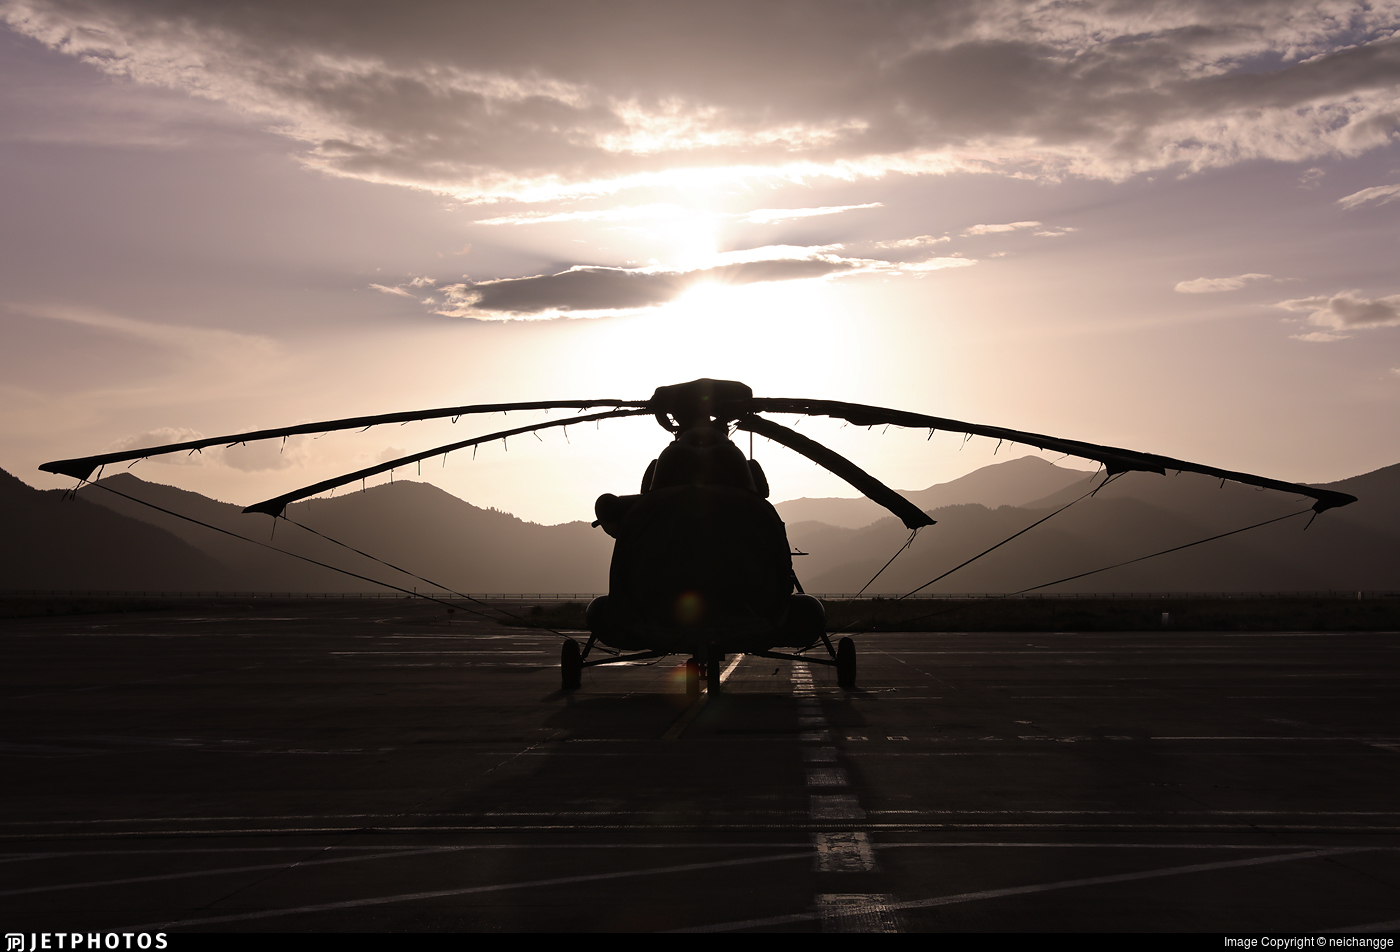 LH92776 - Mil Mi-171E Baikal - China - Army